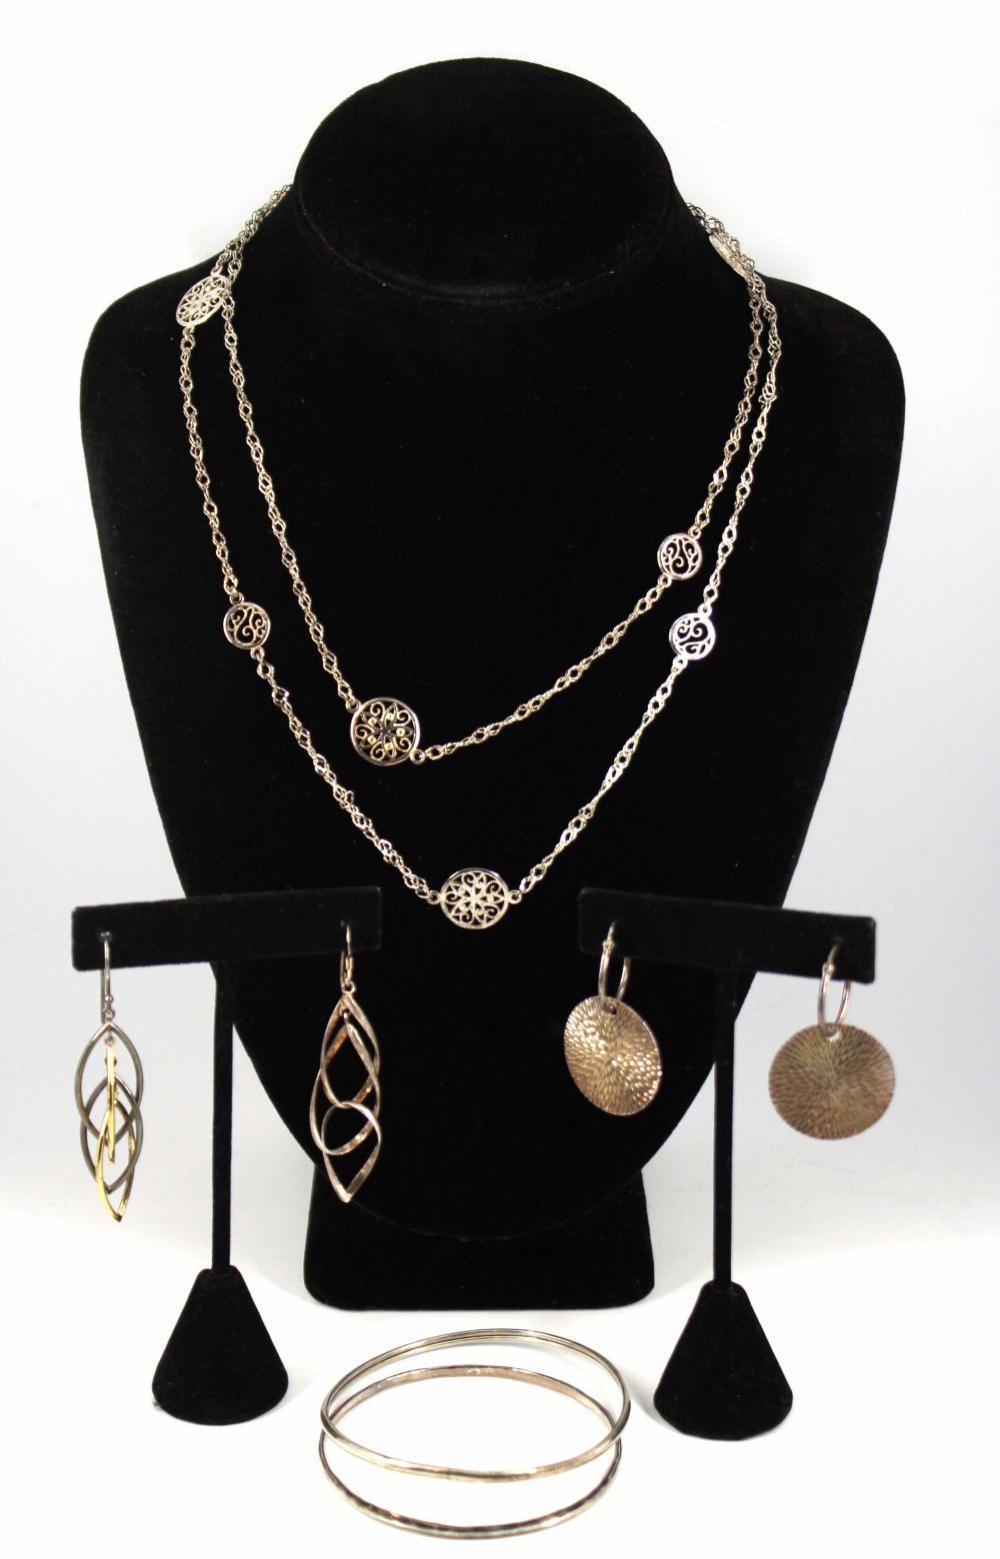 Vintage Mid-Century Modern Silver Jewelry